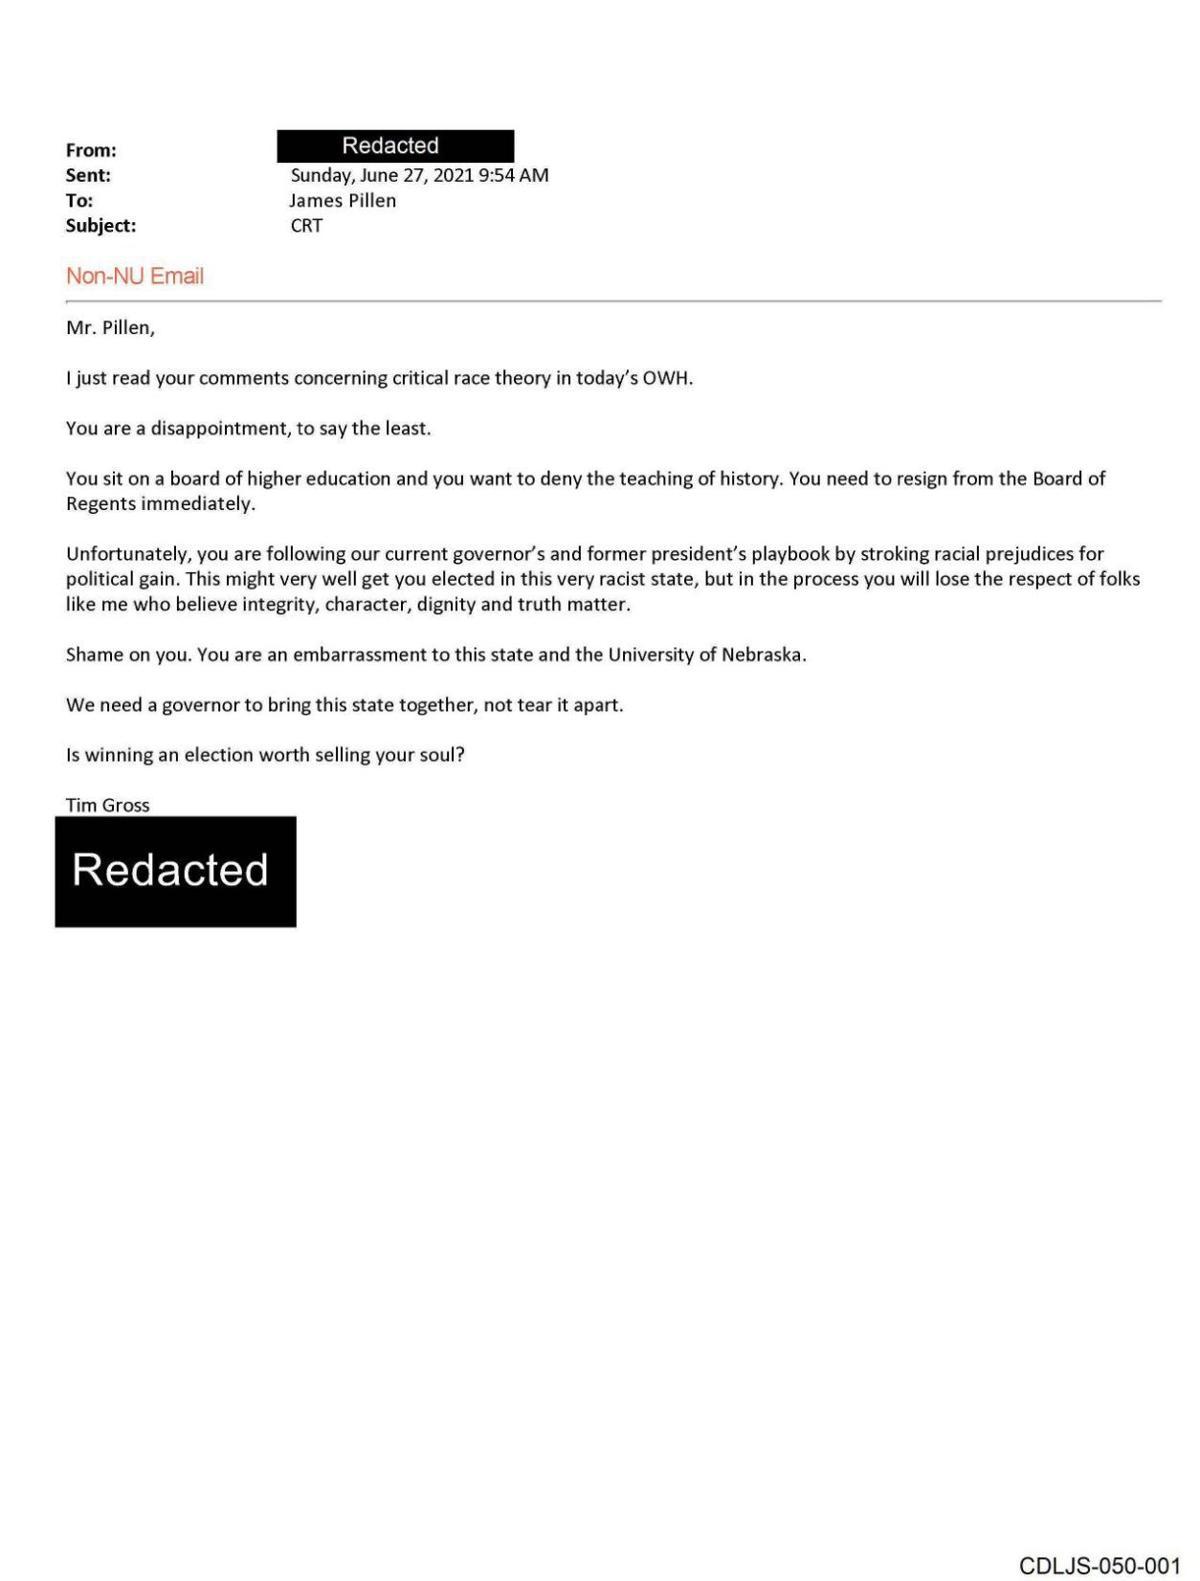 CDLJS-050-001.pdf